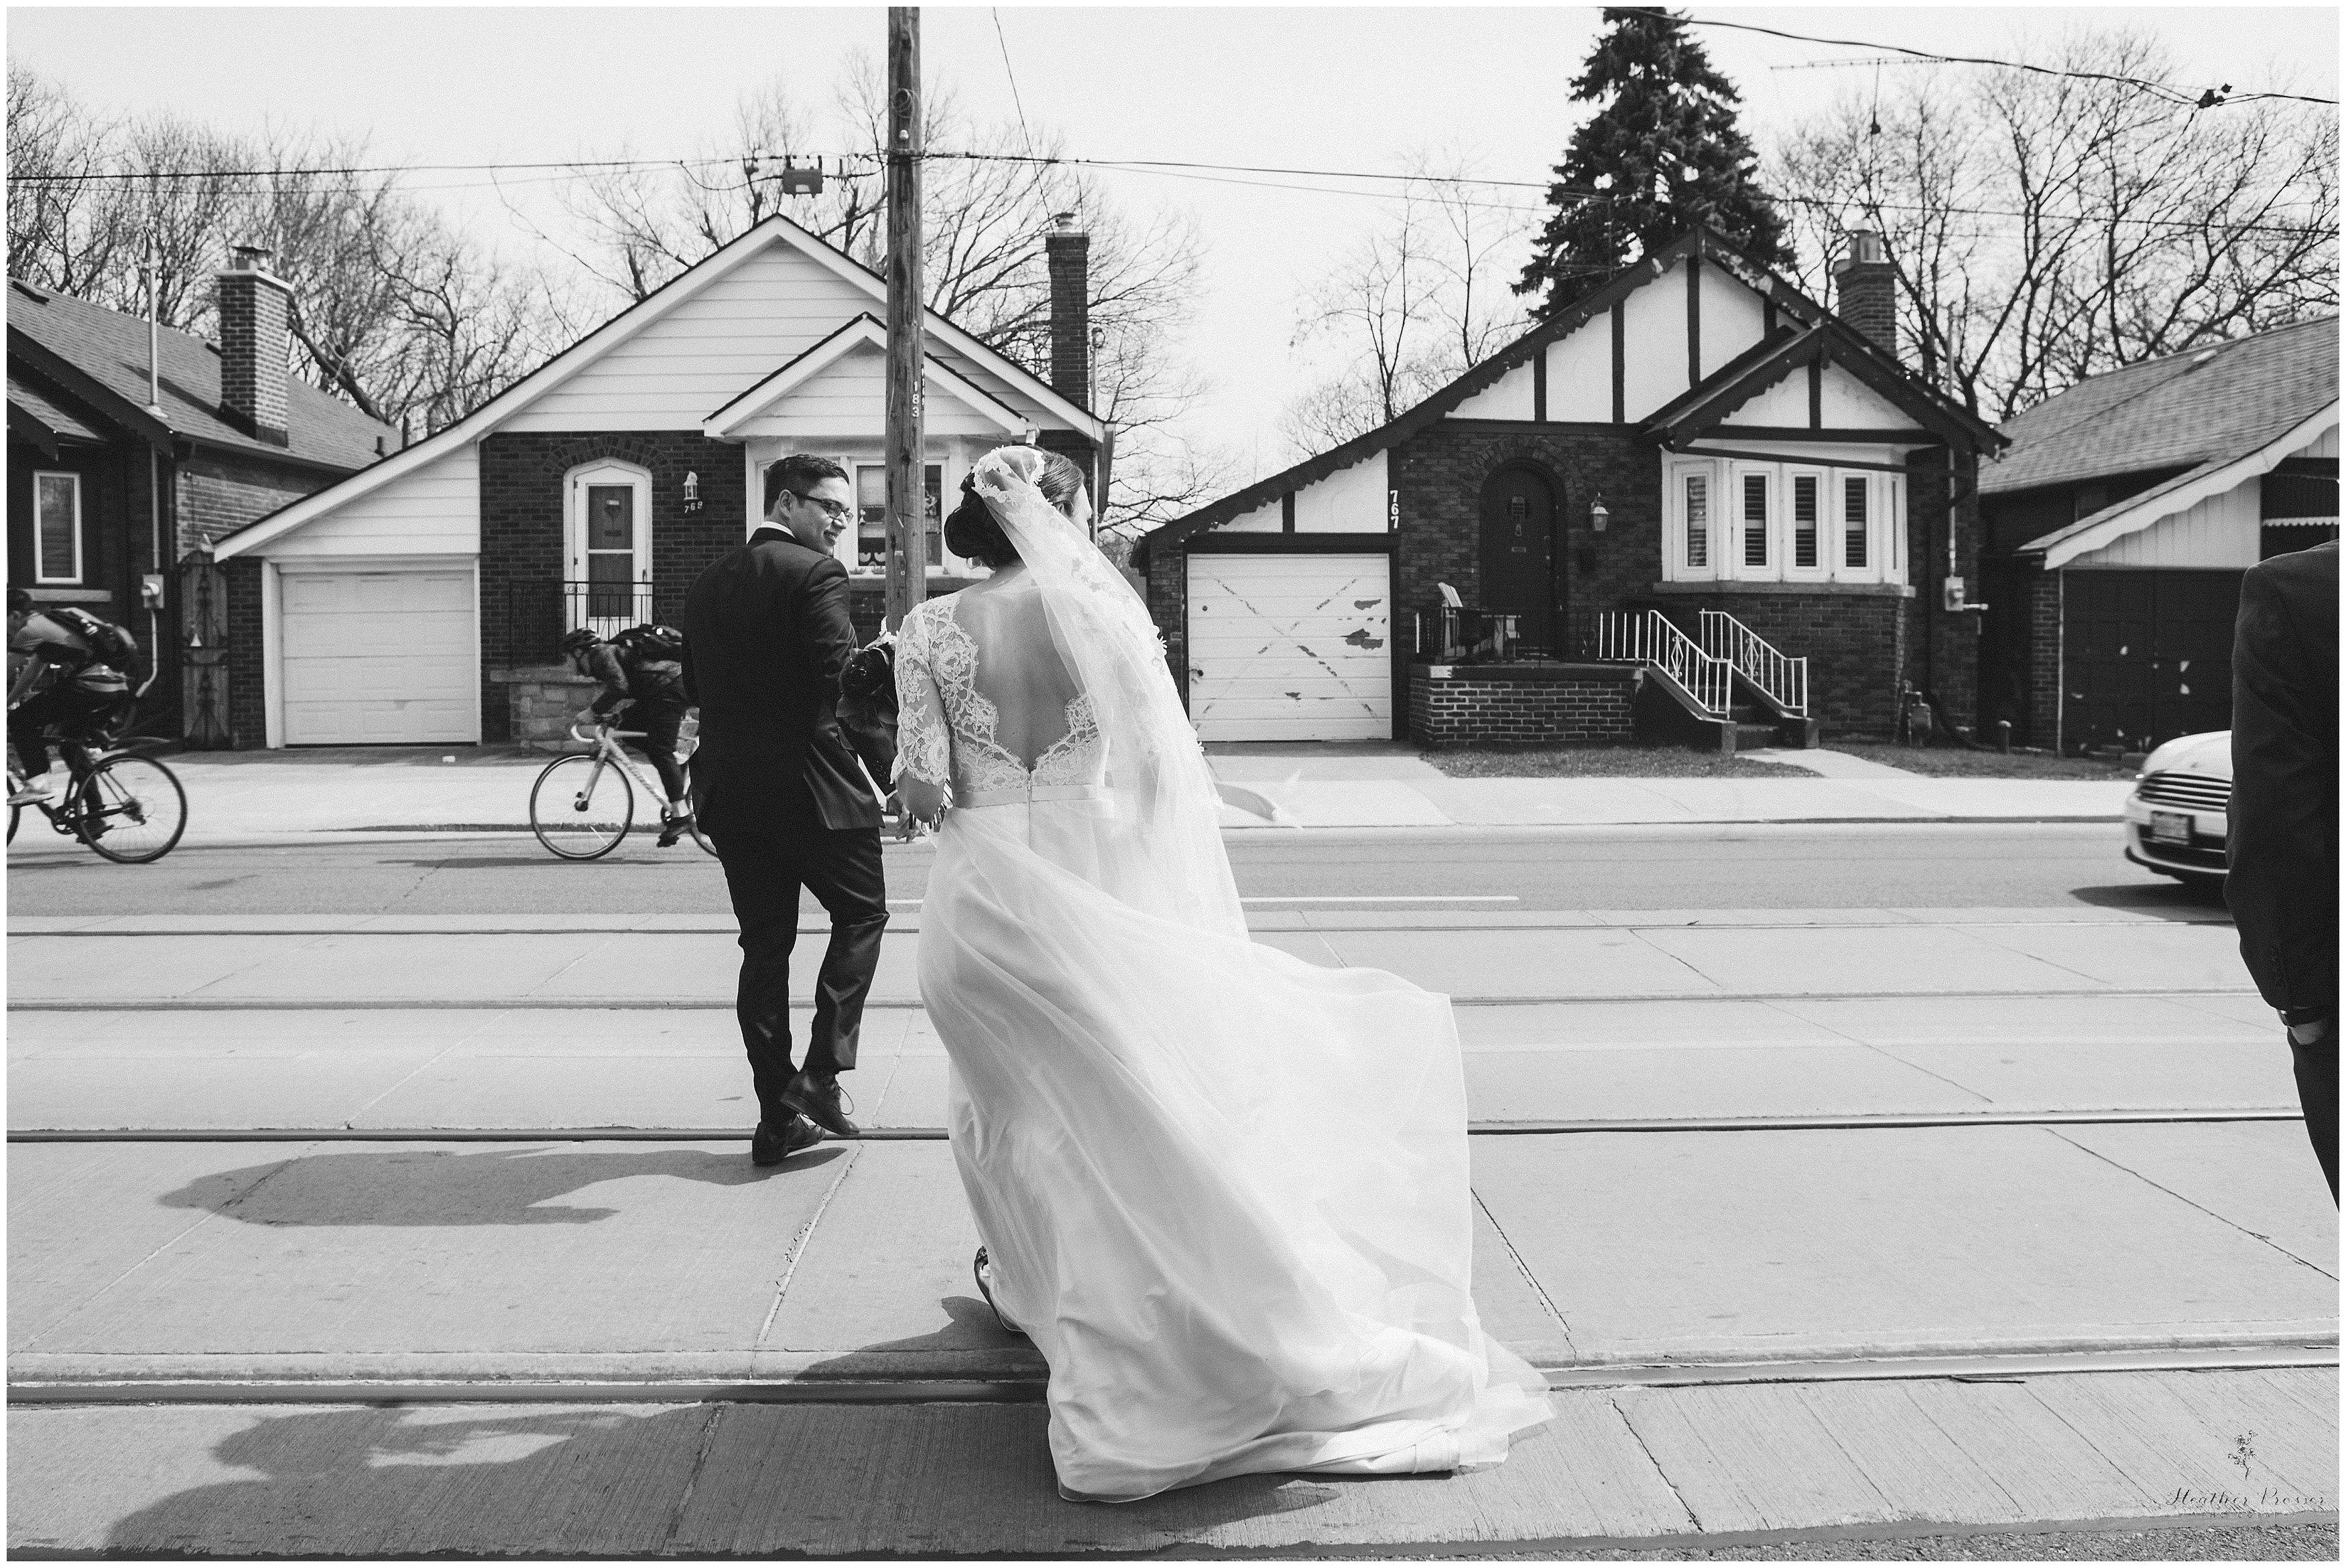 Toronto weddidng_0275.jpg